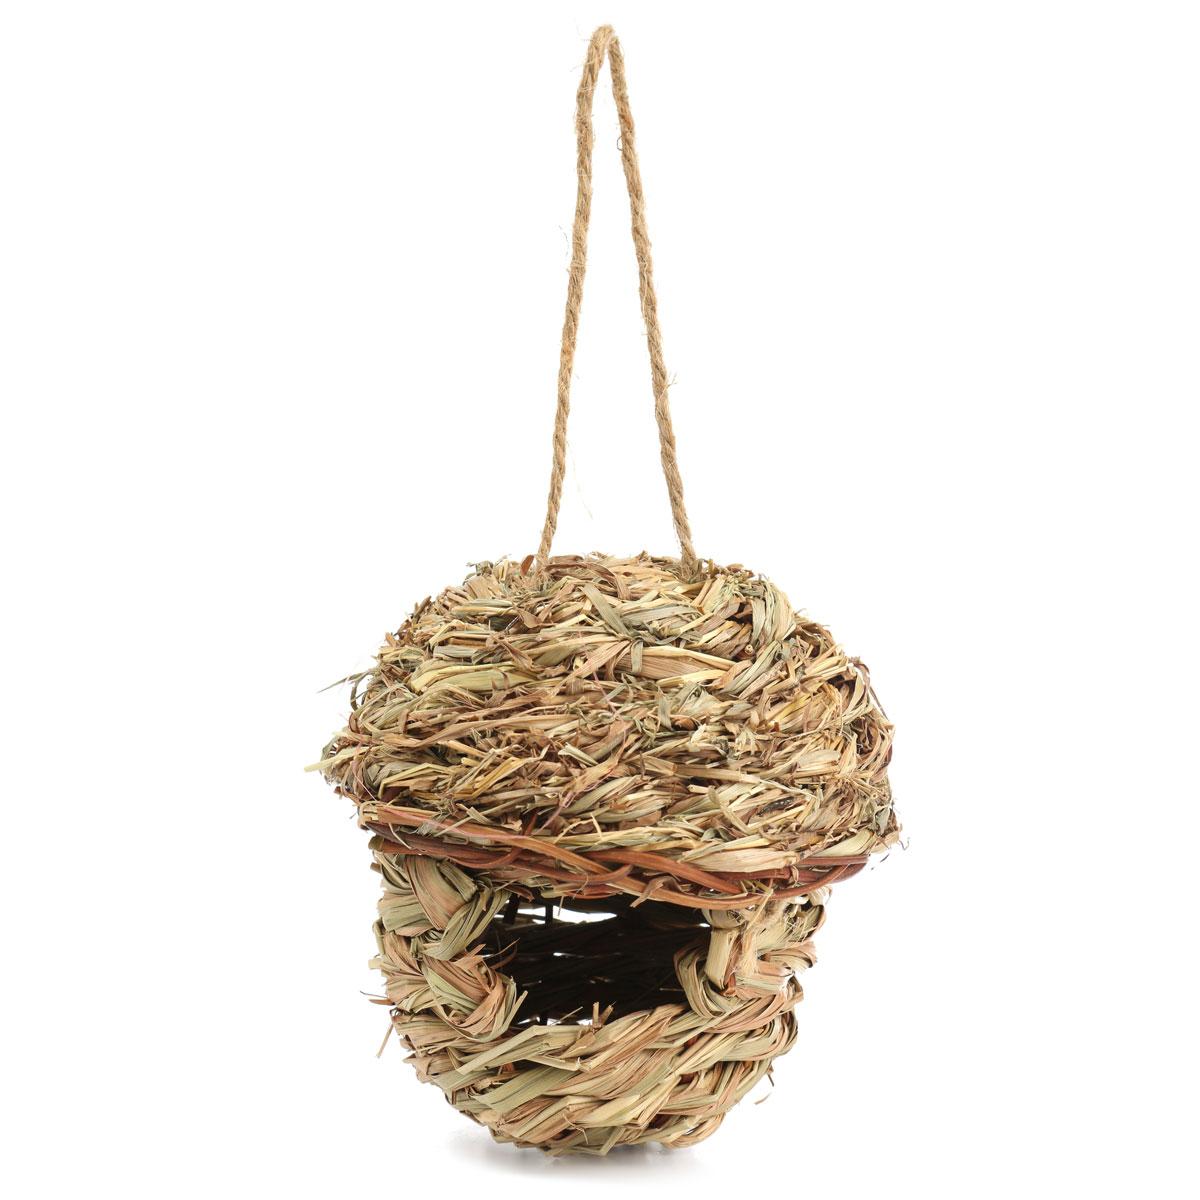 handwoven straw bird nest house par end 3 16 2018 11 15 am. Black Bedroom Furniture Sets. Home Design Ideas